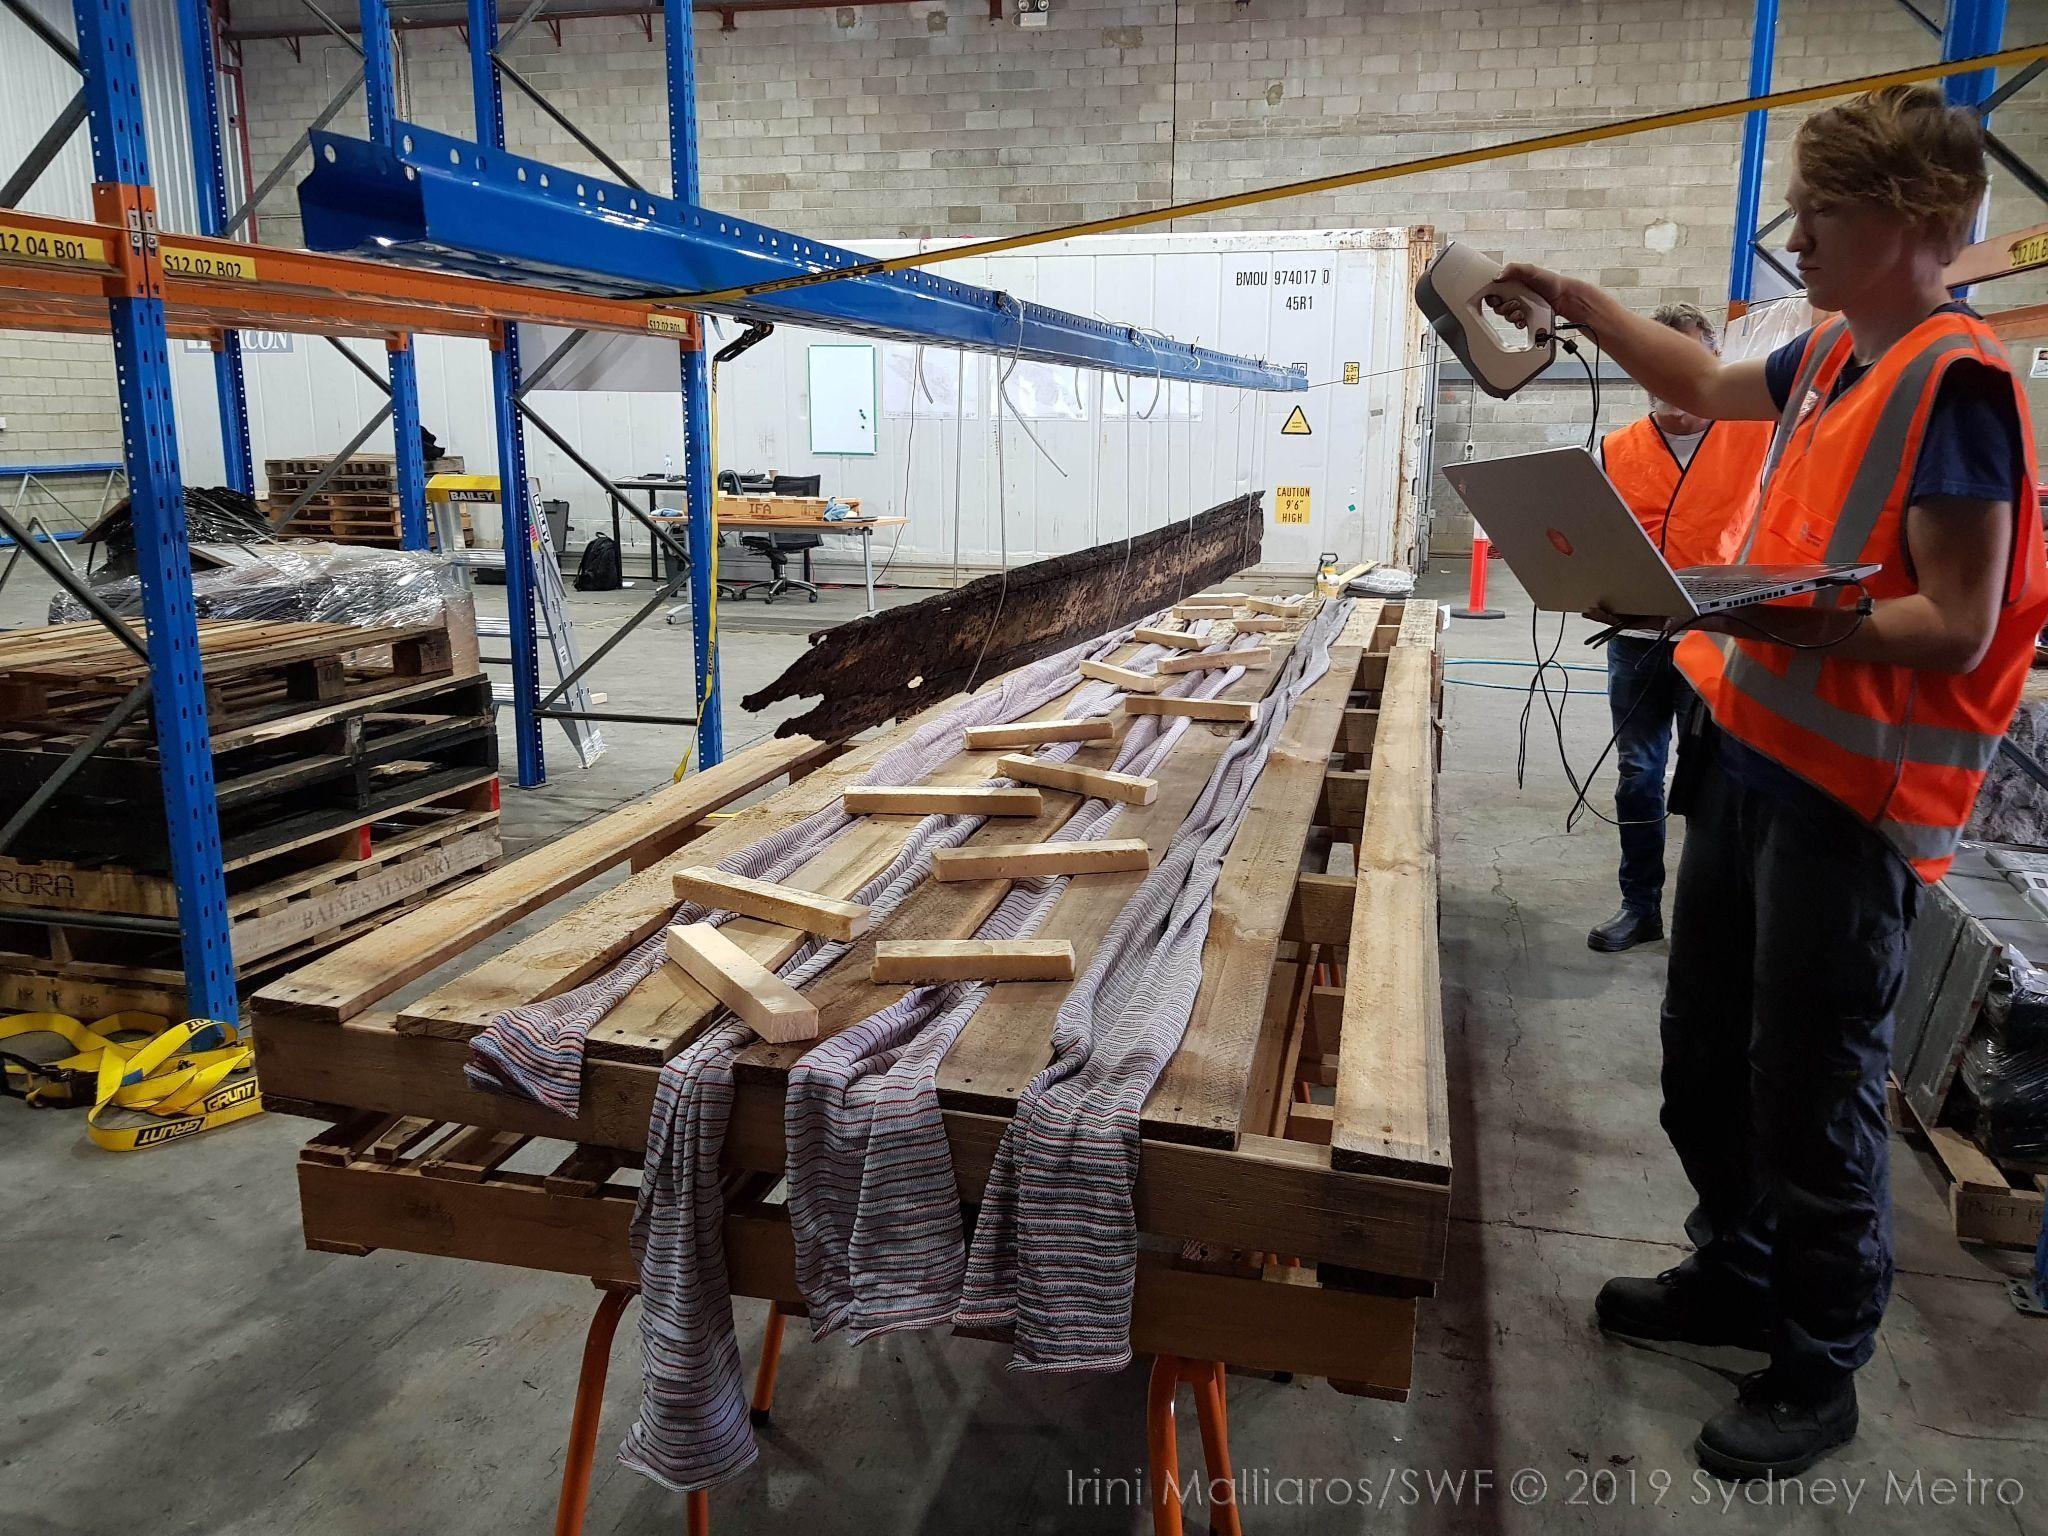 Thomas van Damme demonstrates the scanning technique for the long, thin timber planks of the Barangaroo Boat. Photo via Irini Malliaros / Silentworld Foundation / Sydney Metro.